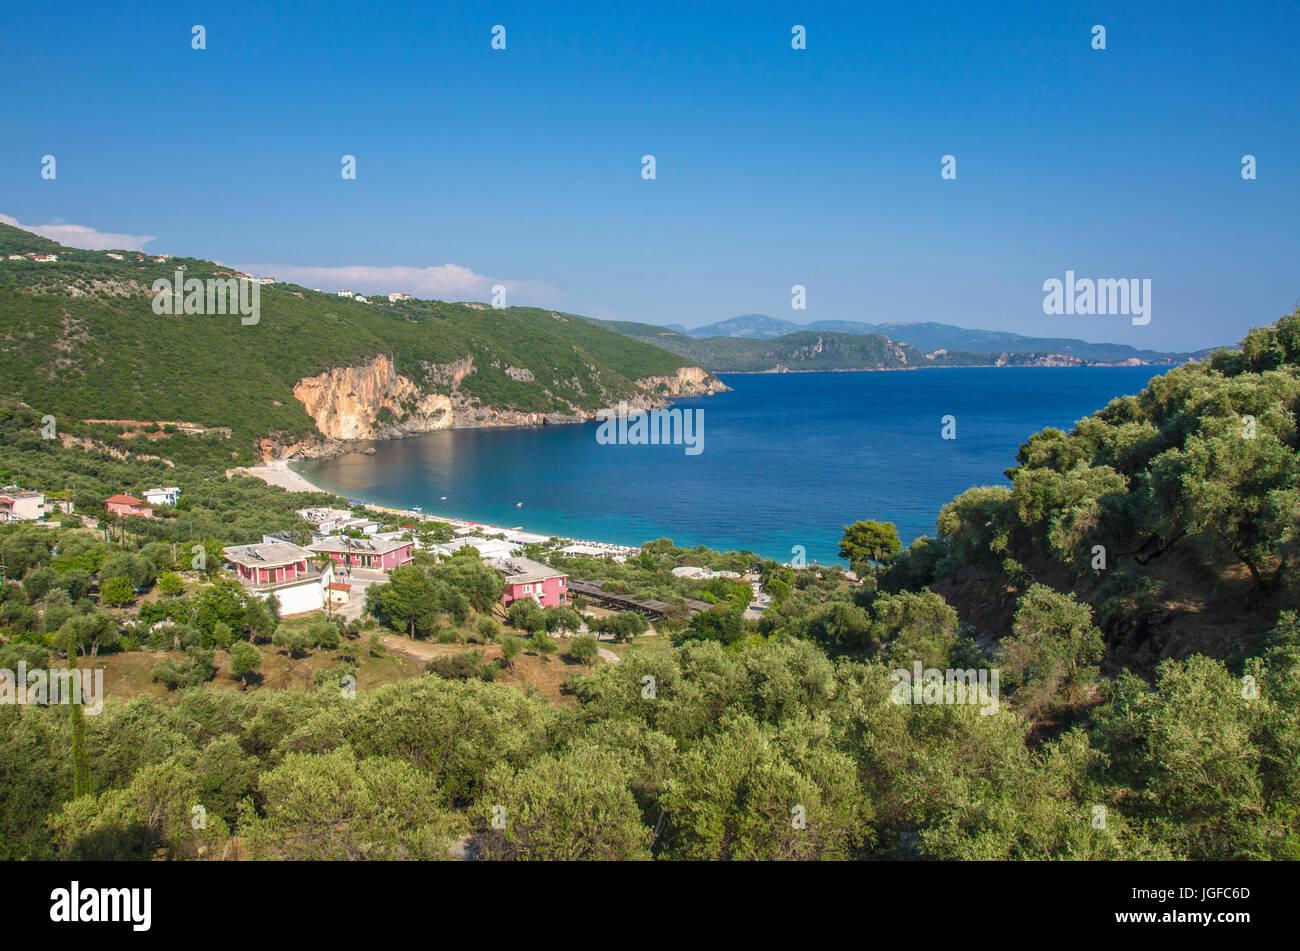 Lichnos Beach - Mer Ionienne - Parga, Preveza, Épire, Grèce Photo Stock